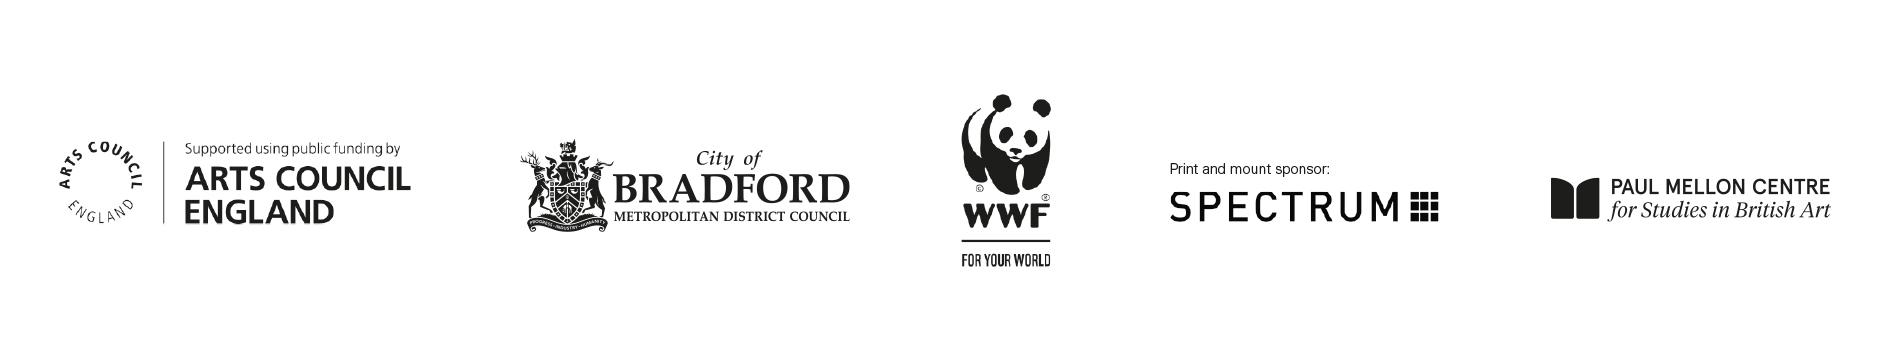 Logos for Our Plastic Ocean